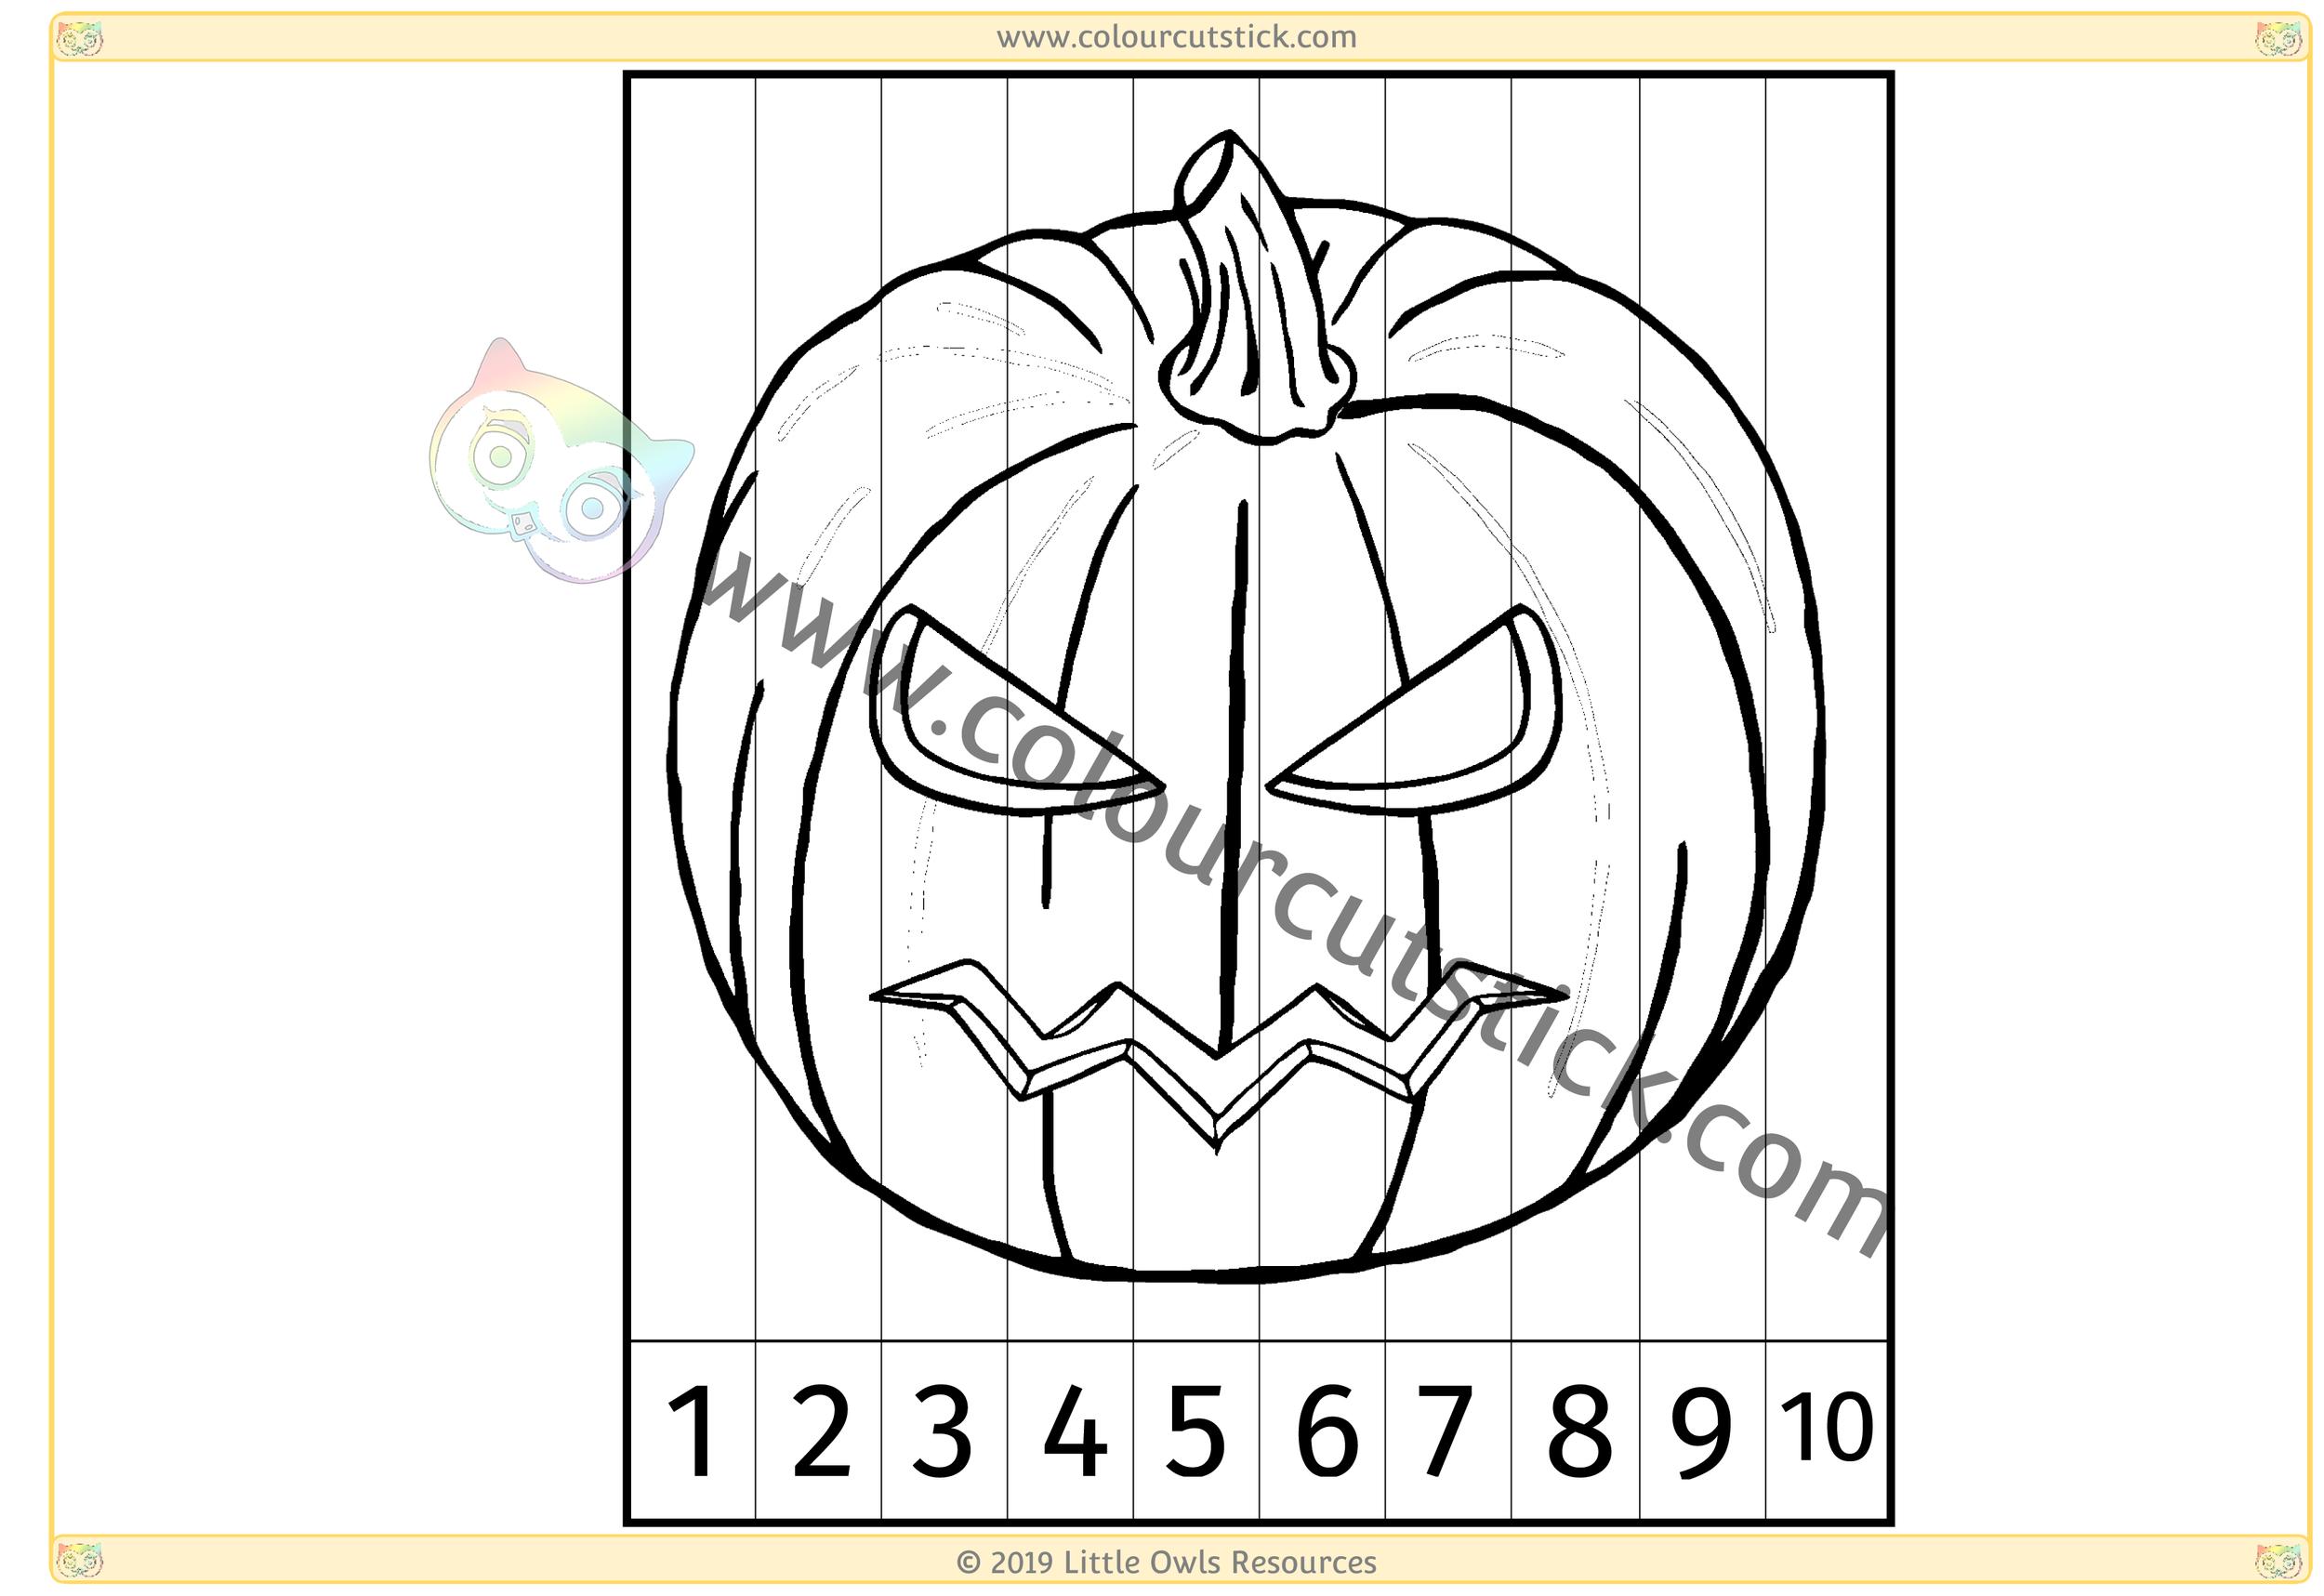 Spooky Pumpkin Number Slice Puzzle 1-10 -